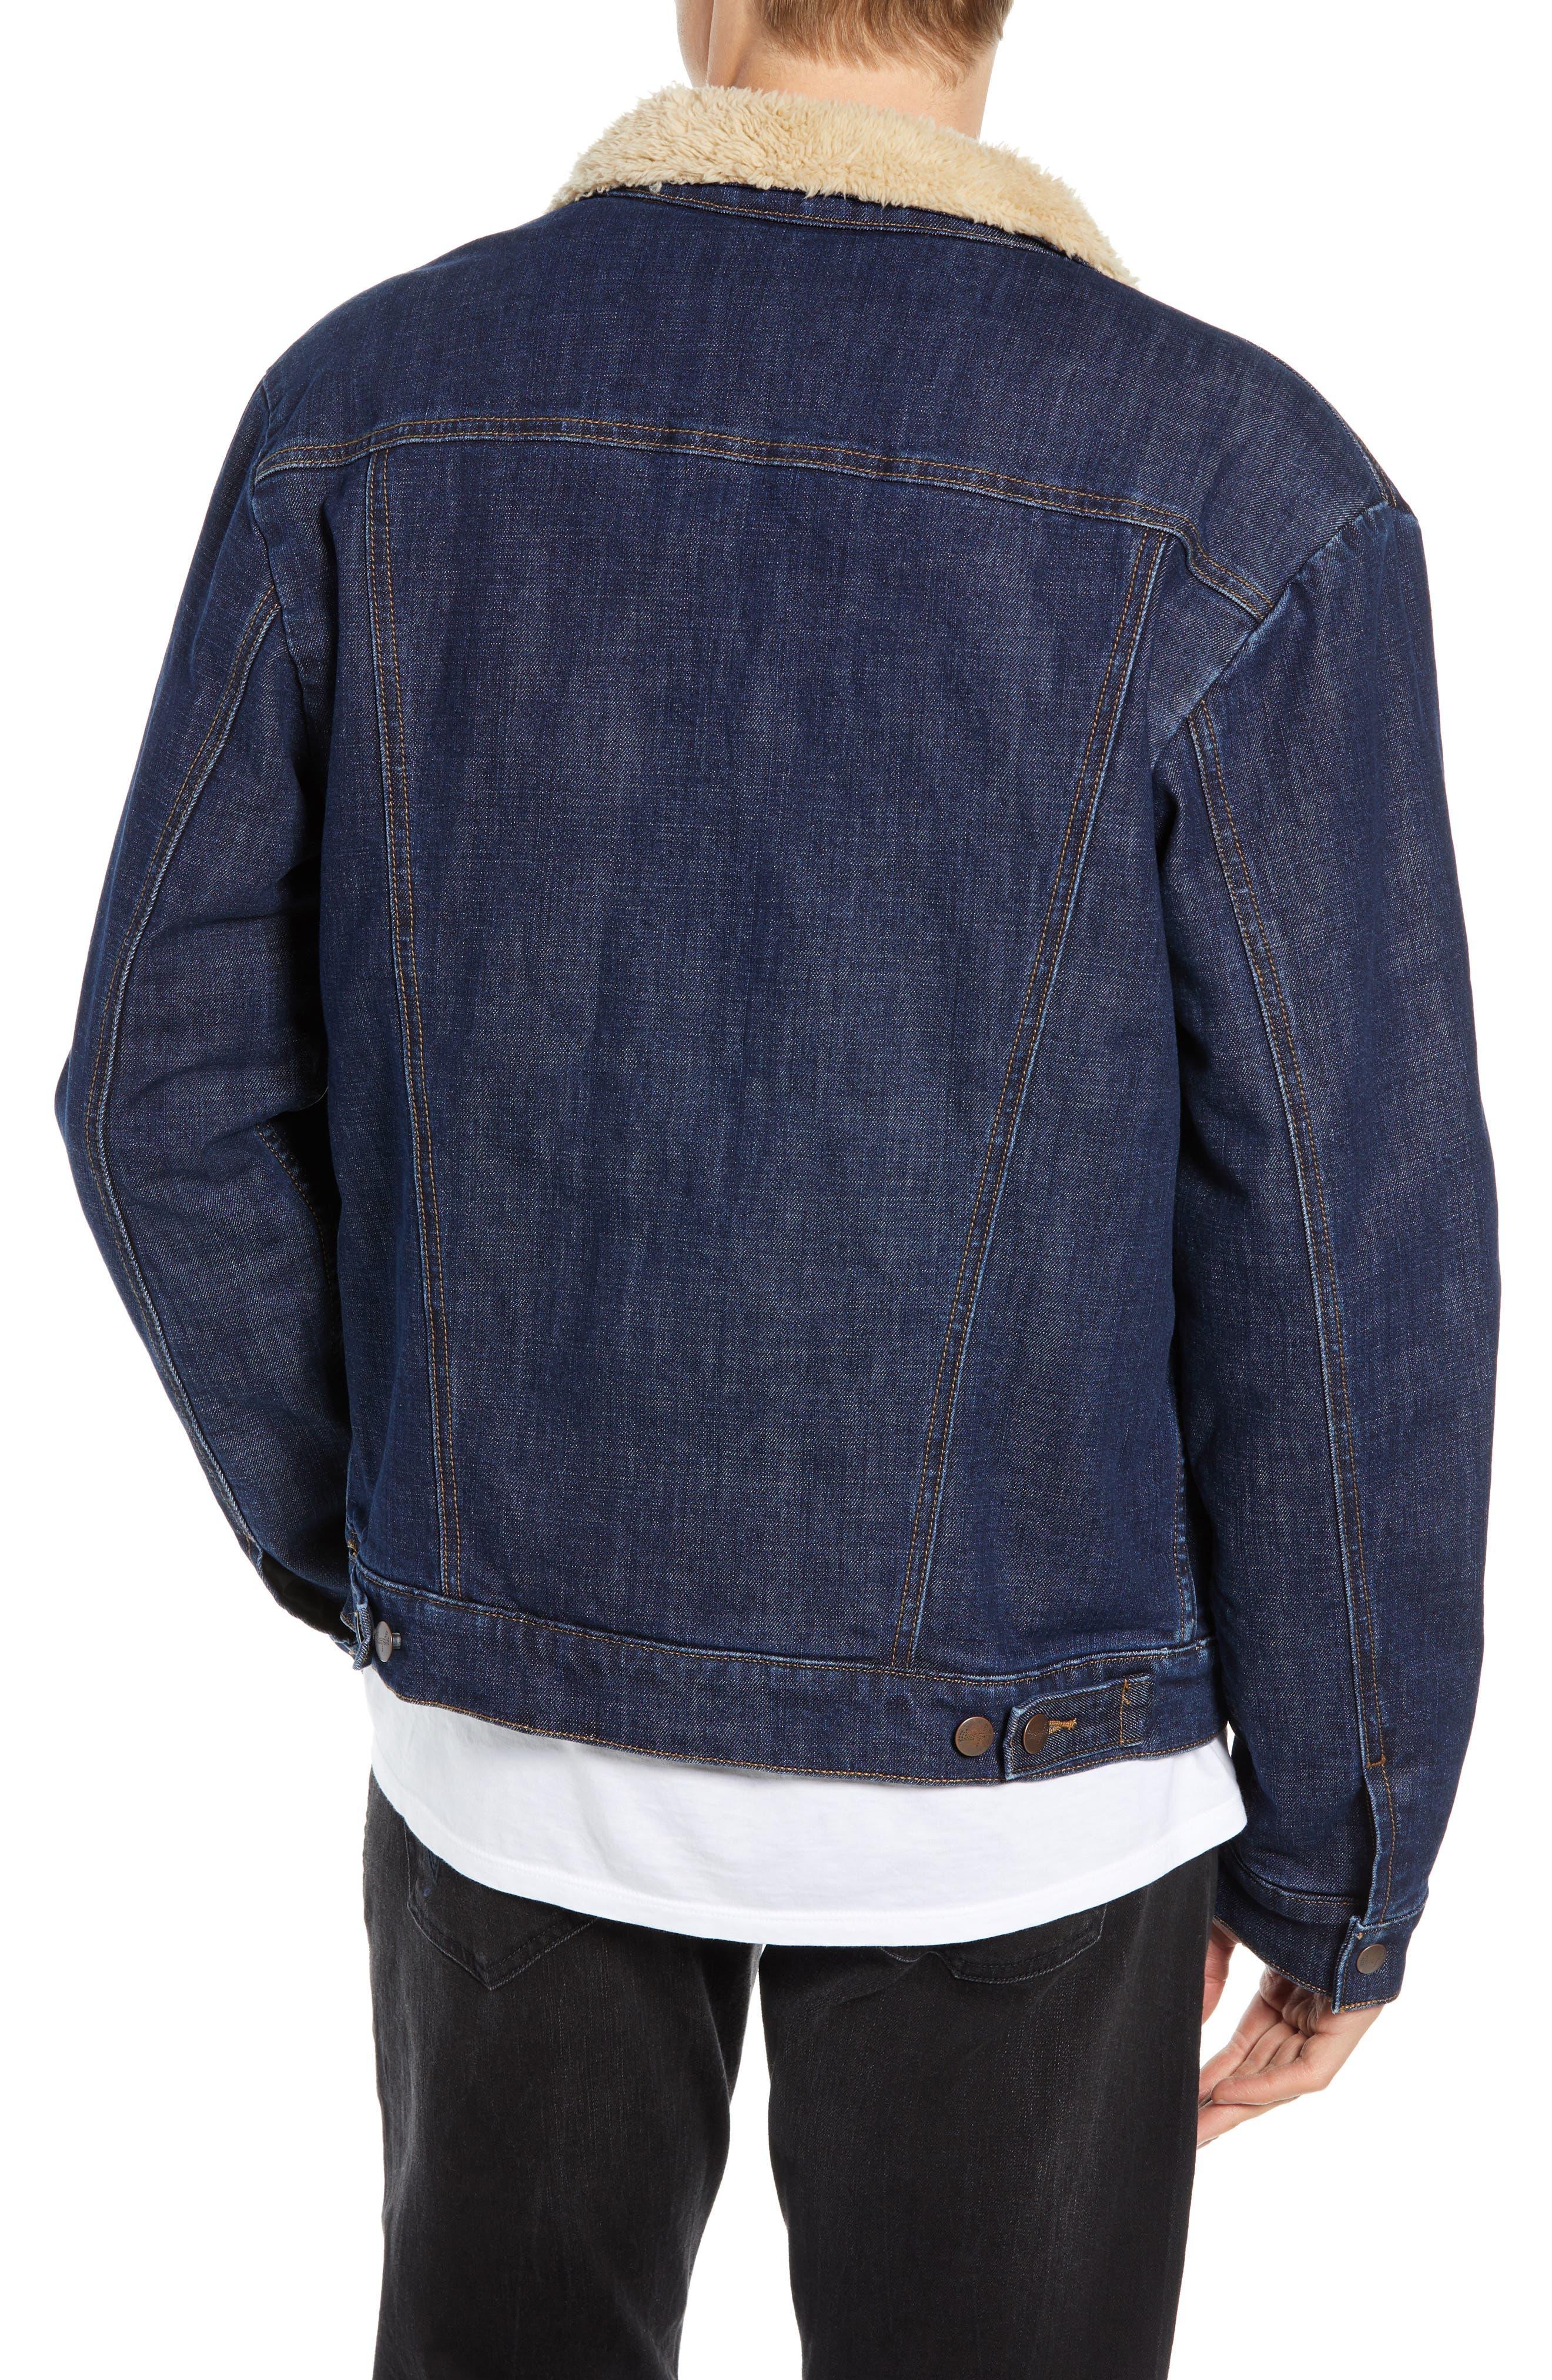 WRANGLER, Heritage Fleece Lined Denim Jacket, Alternate thumbnail 2, color, 472